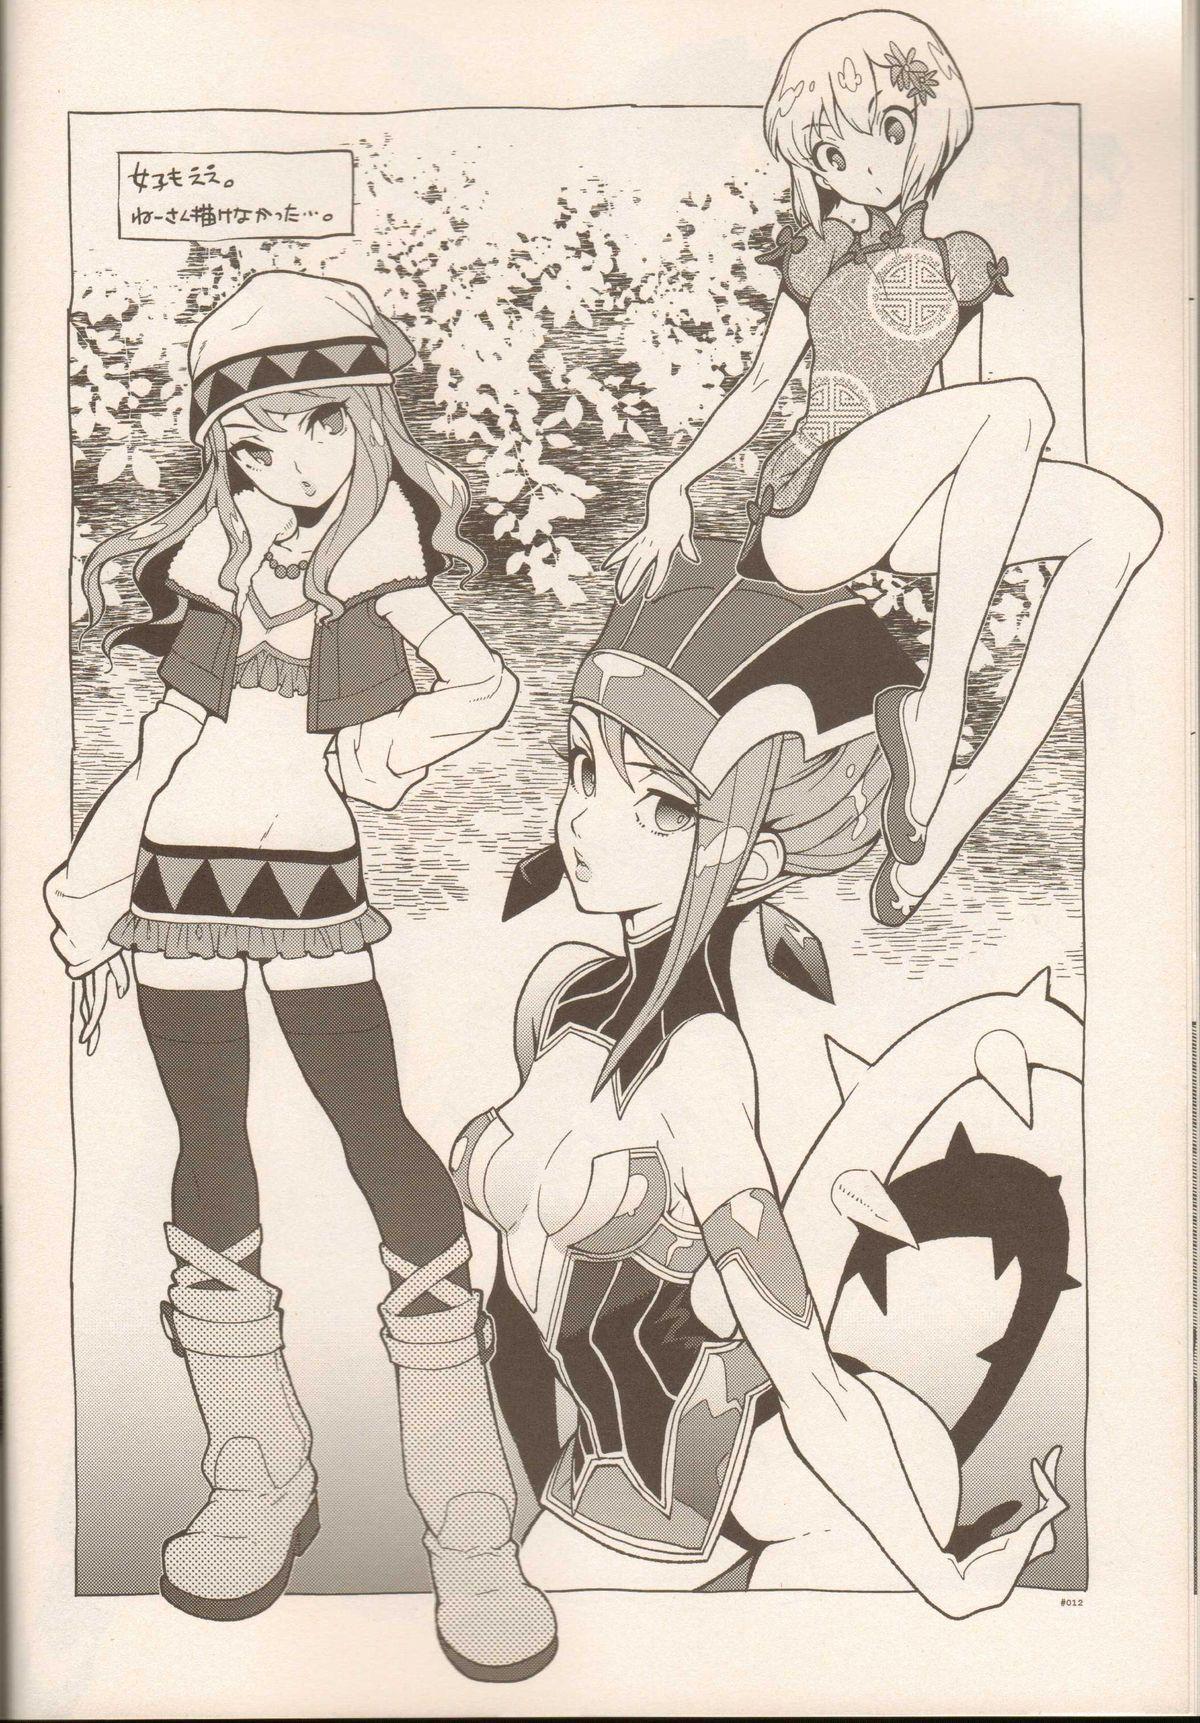 RaKuGaKi./Monochrome. 10